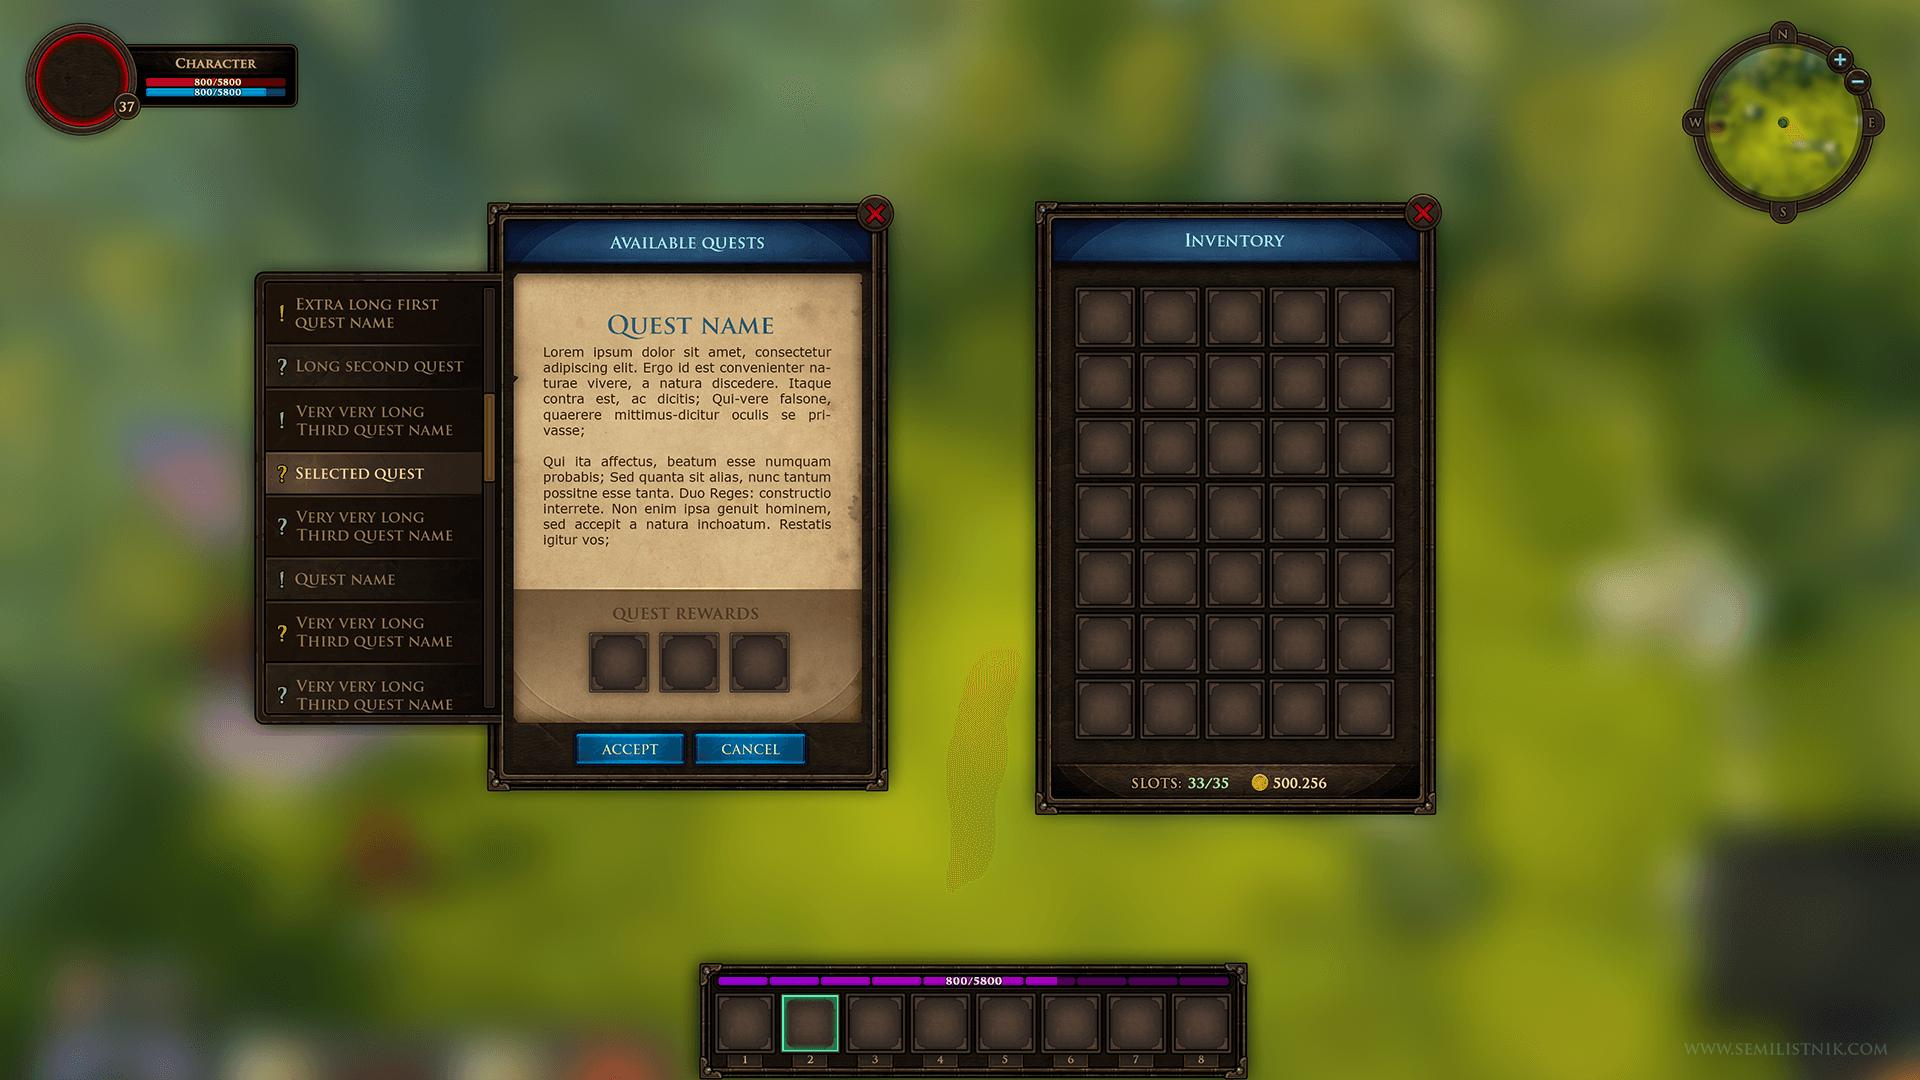 MMORPG UI Kit by Dmitriy Fomenko in 2D Assets - UE4 Marketplace